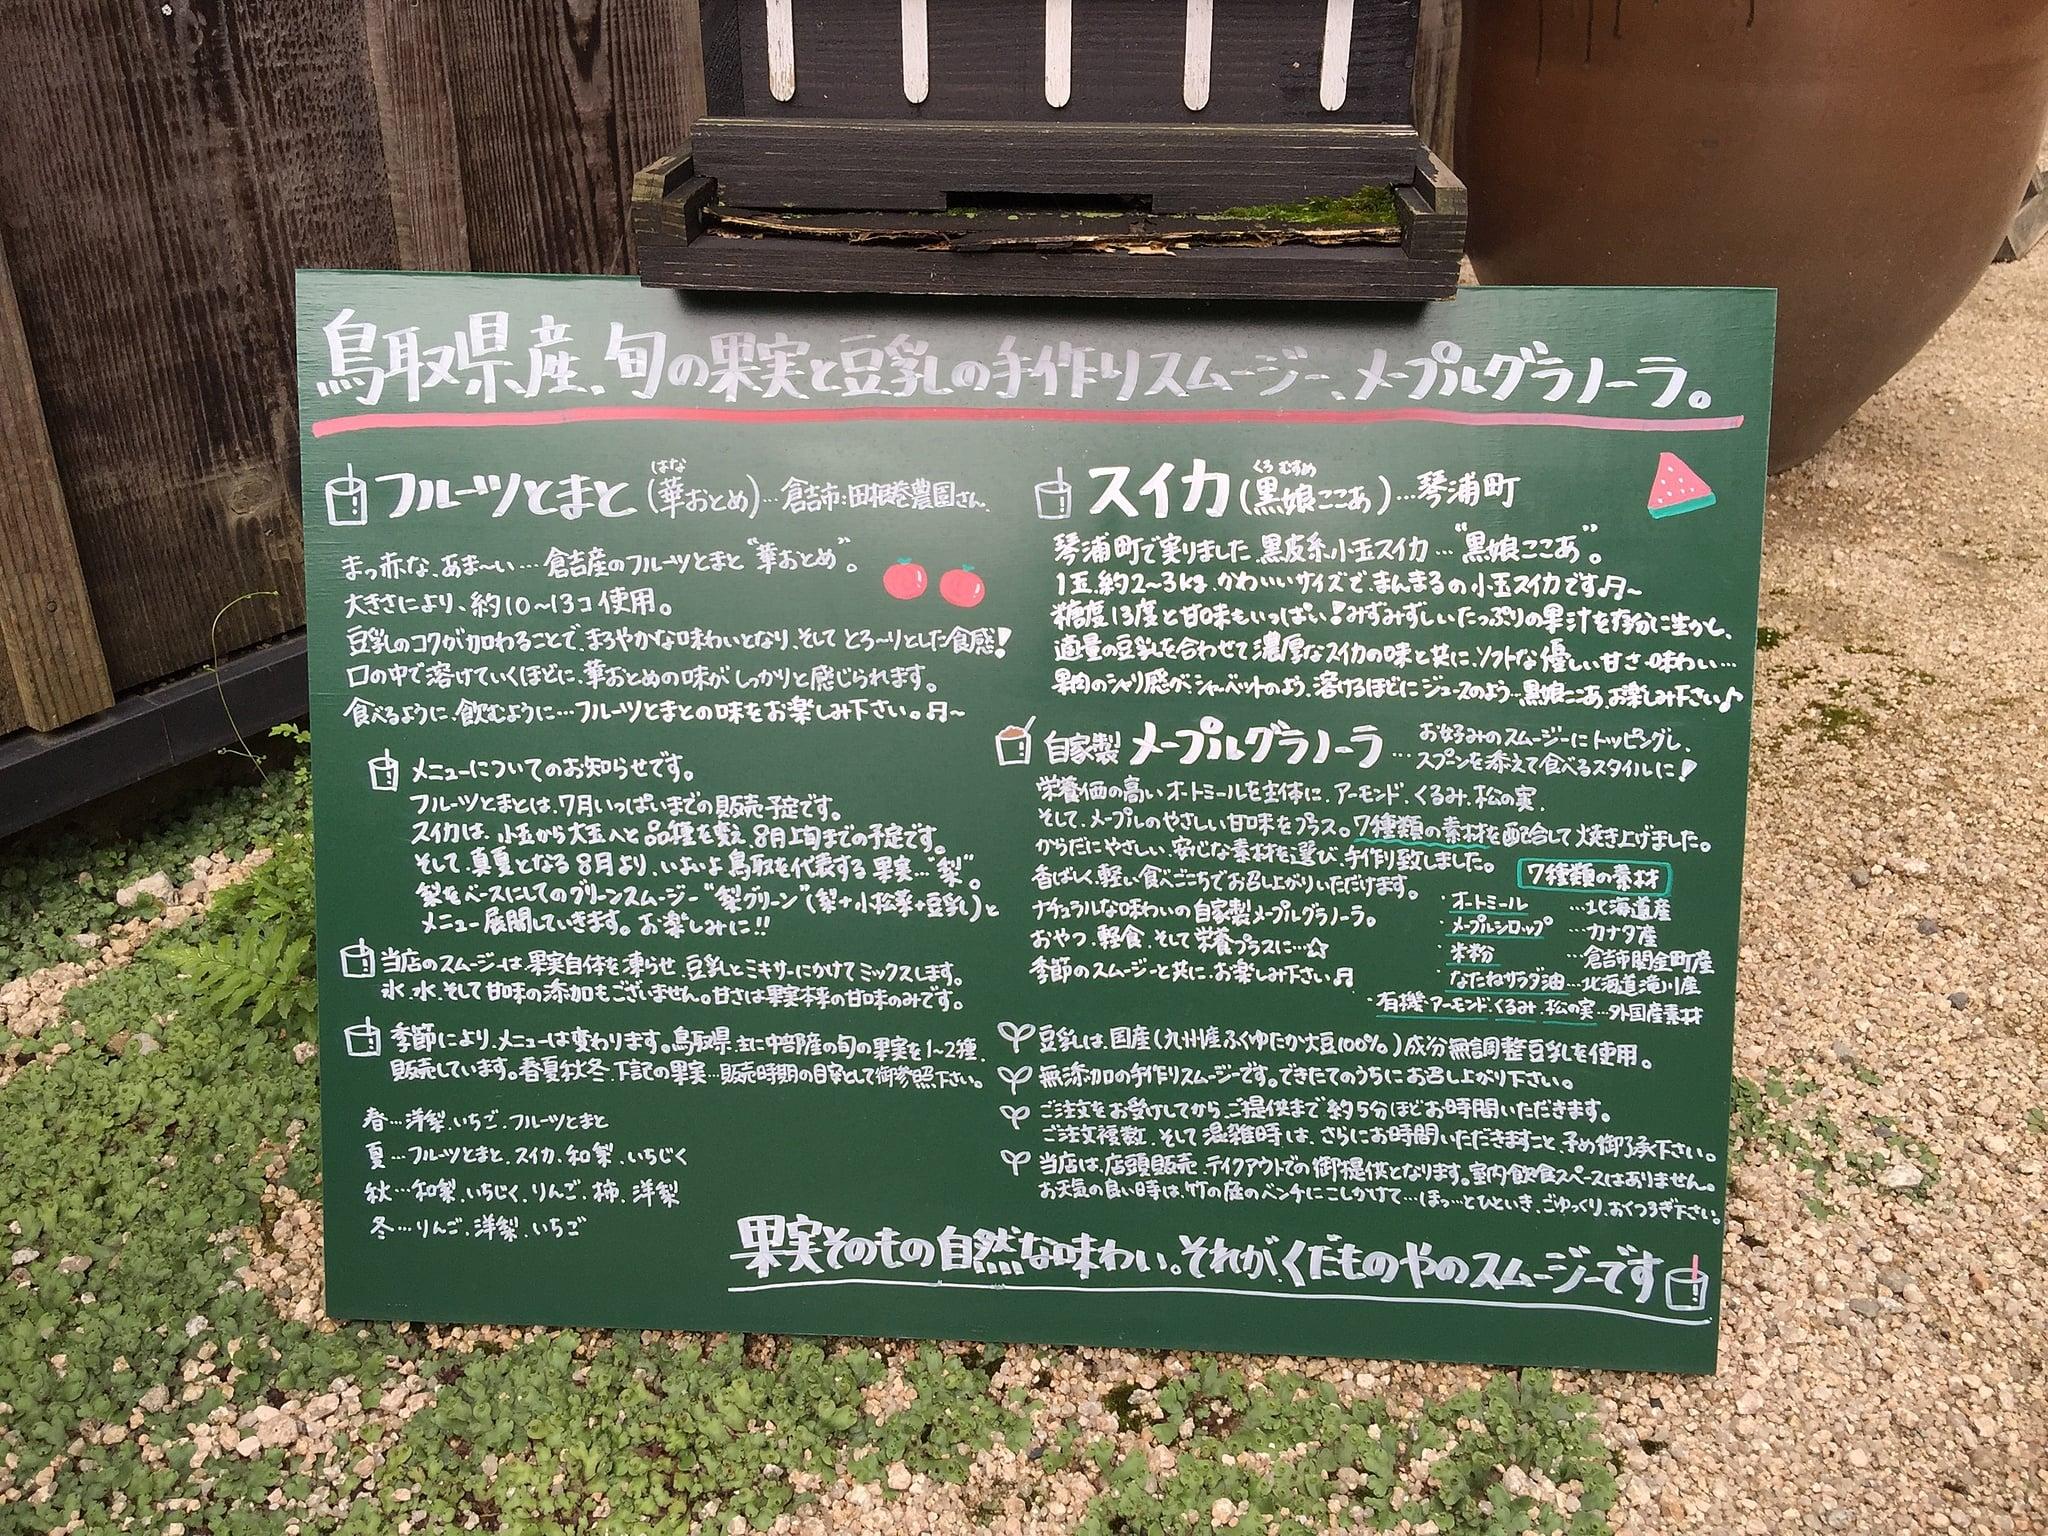 http://ogura-sekkei.jp/files/libs/49/201607091553131548.JPG